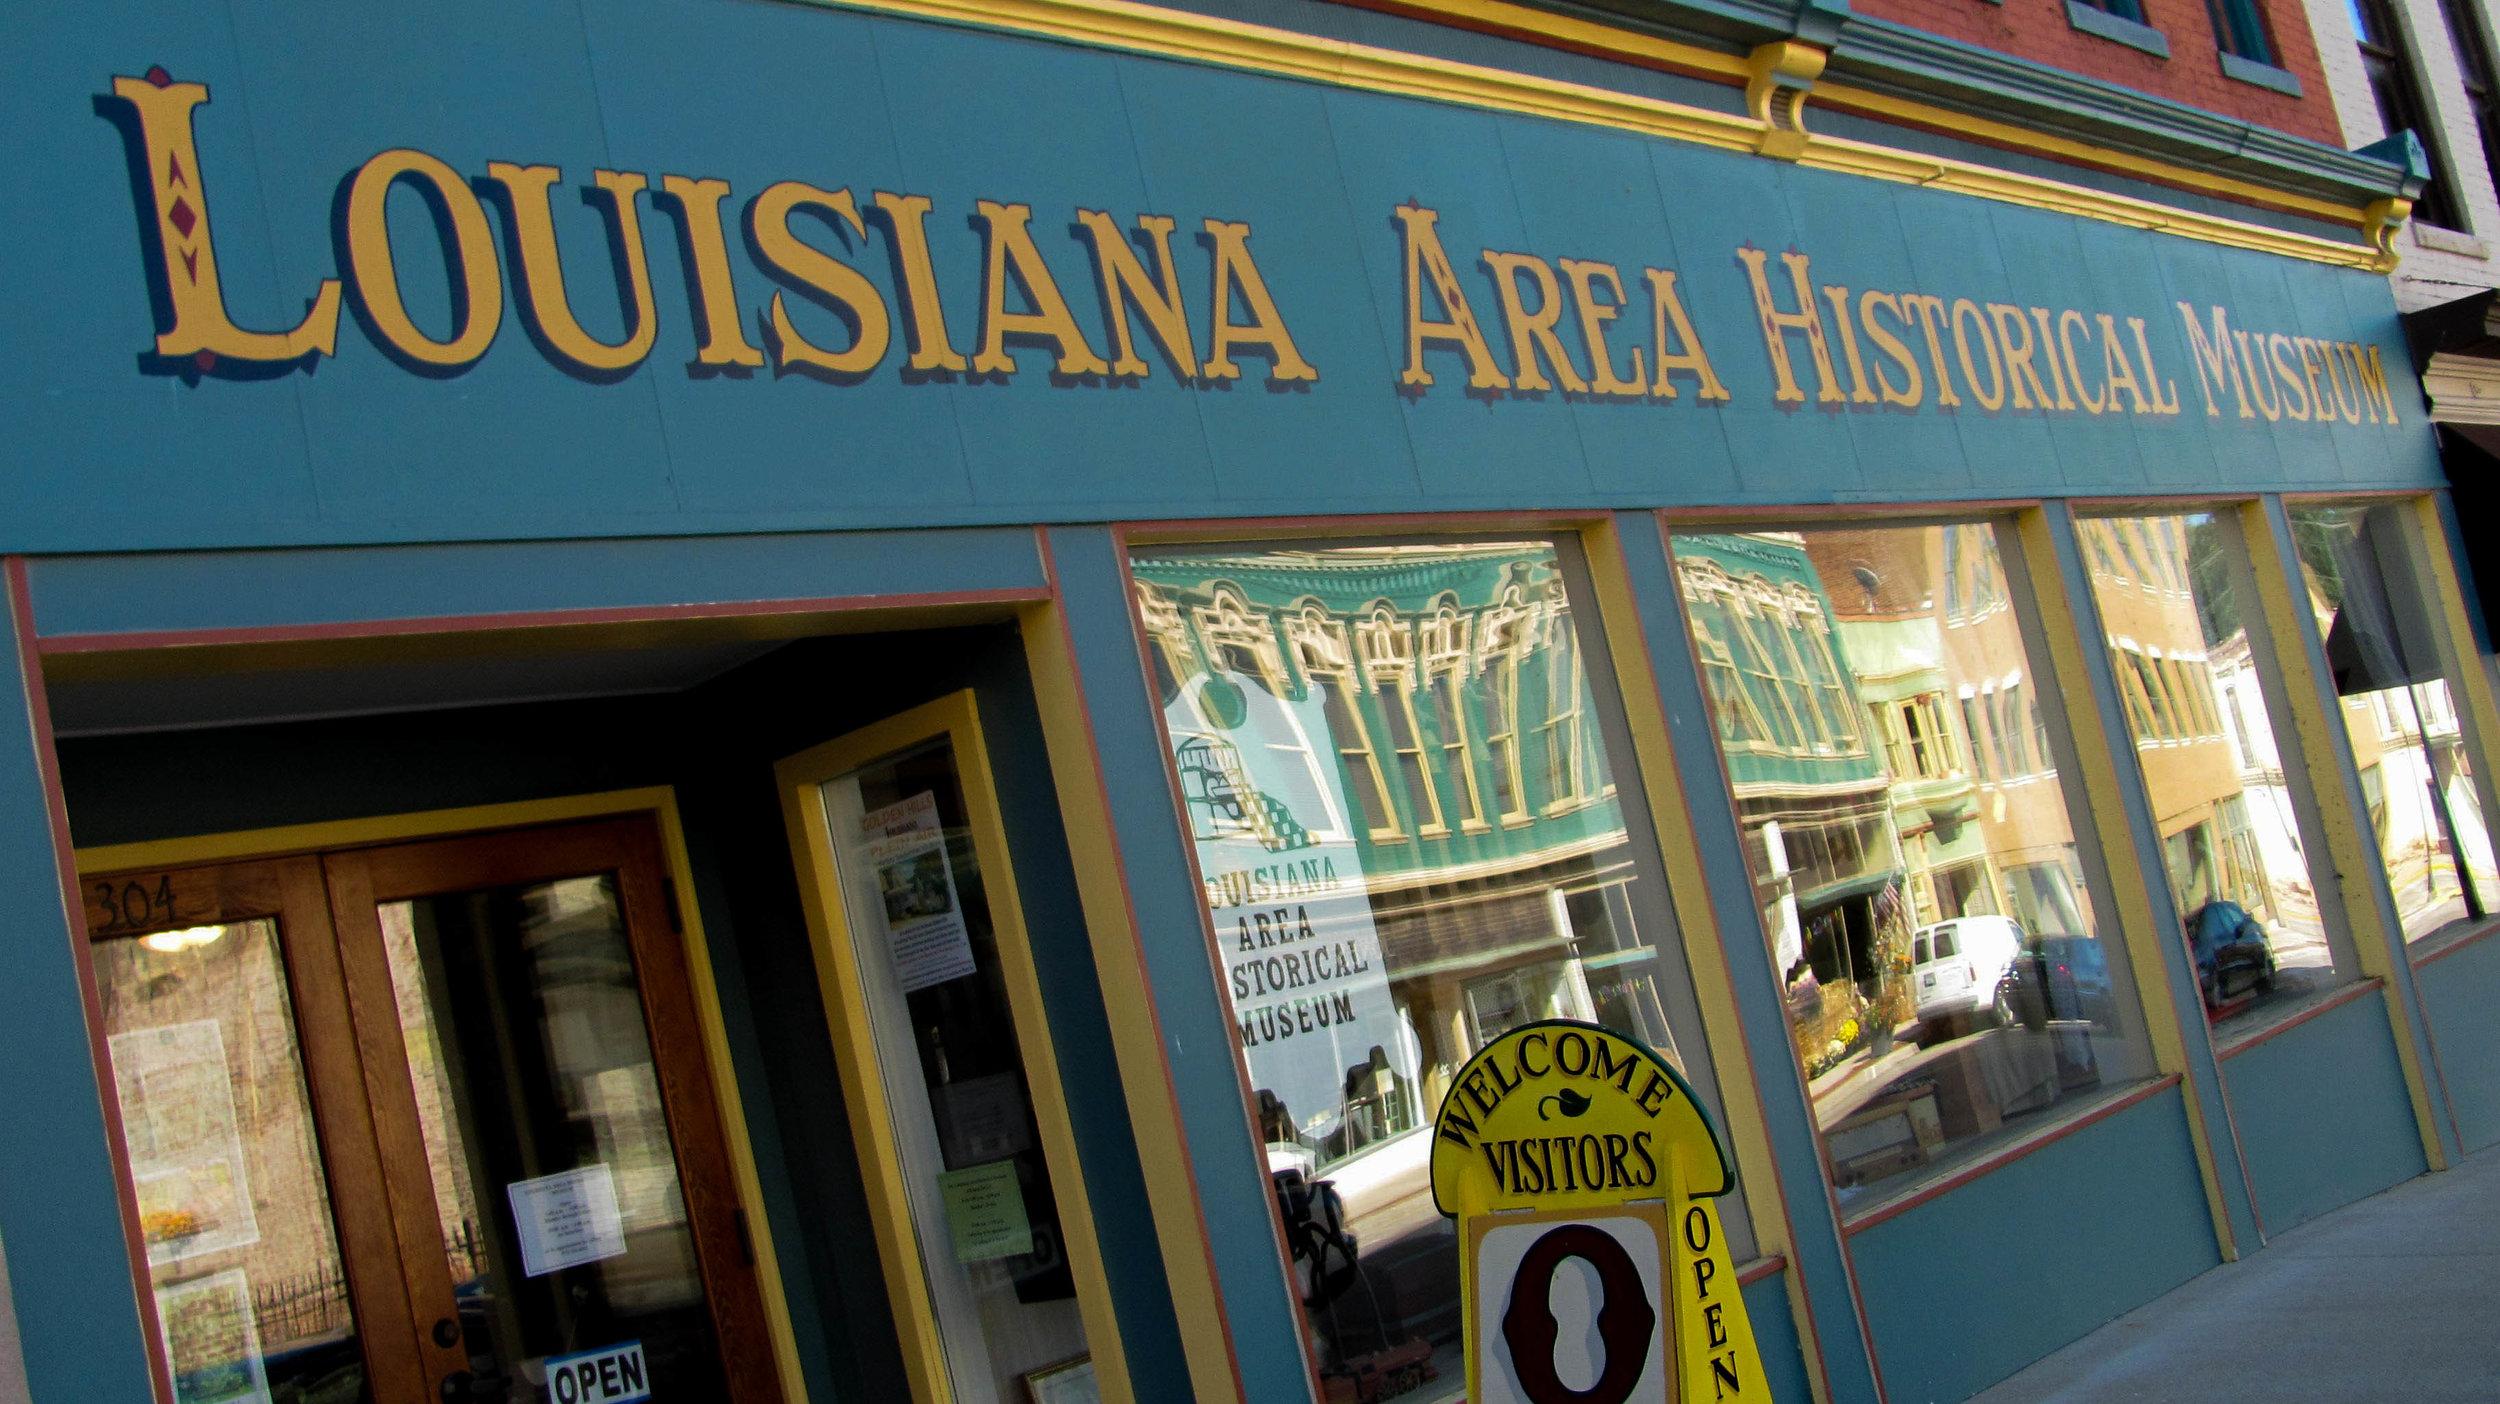 Louisiana Area Historical Museum Louisiana, Missouri